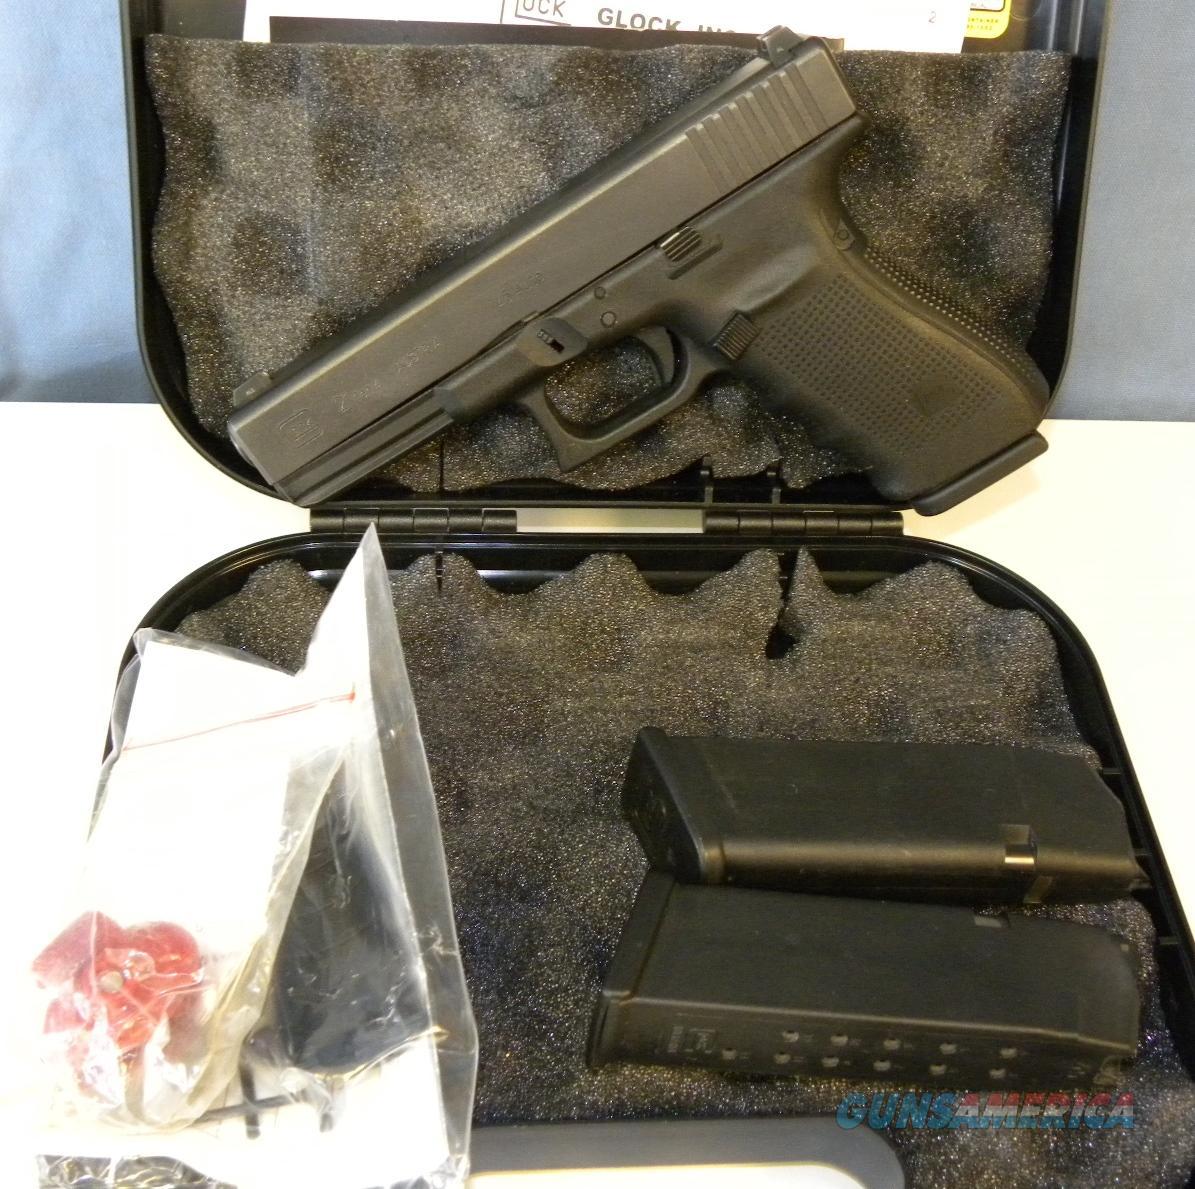 Glock 21 Gen 4  Guns > Pistols > Glock Pistols > 20/21